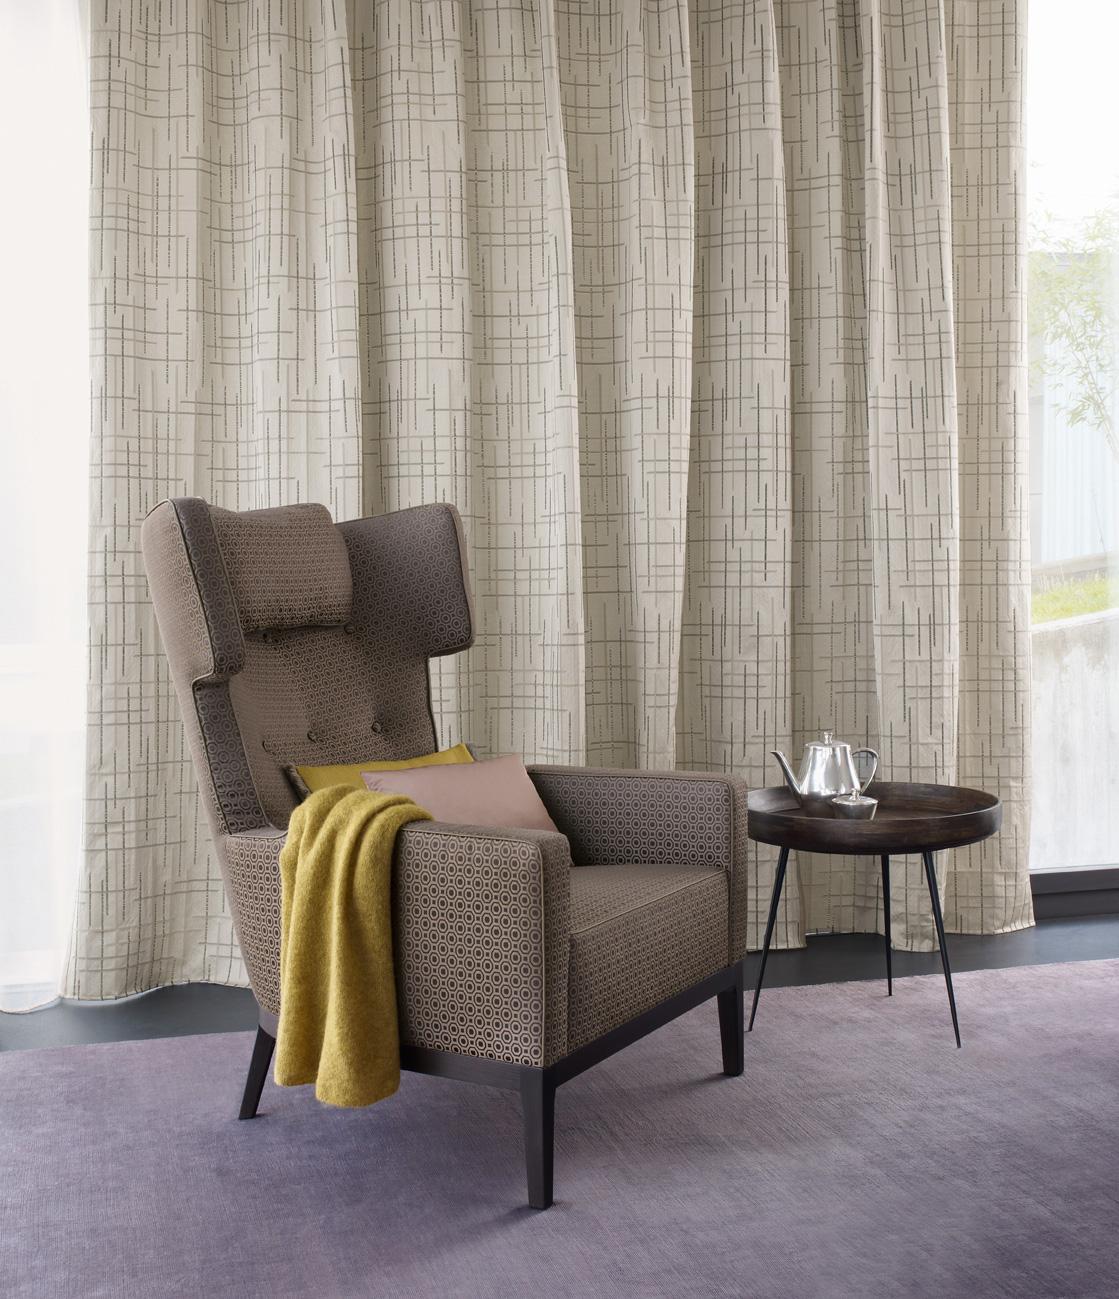 le collection geometric de zimmer rohde int rieurs. Black Bedroom Furniture Sets. Home Design Ideas